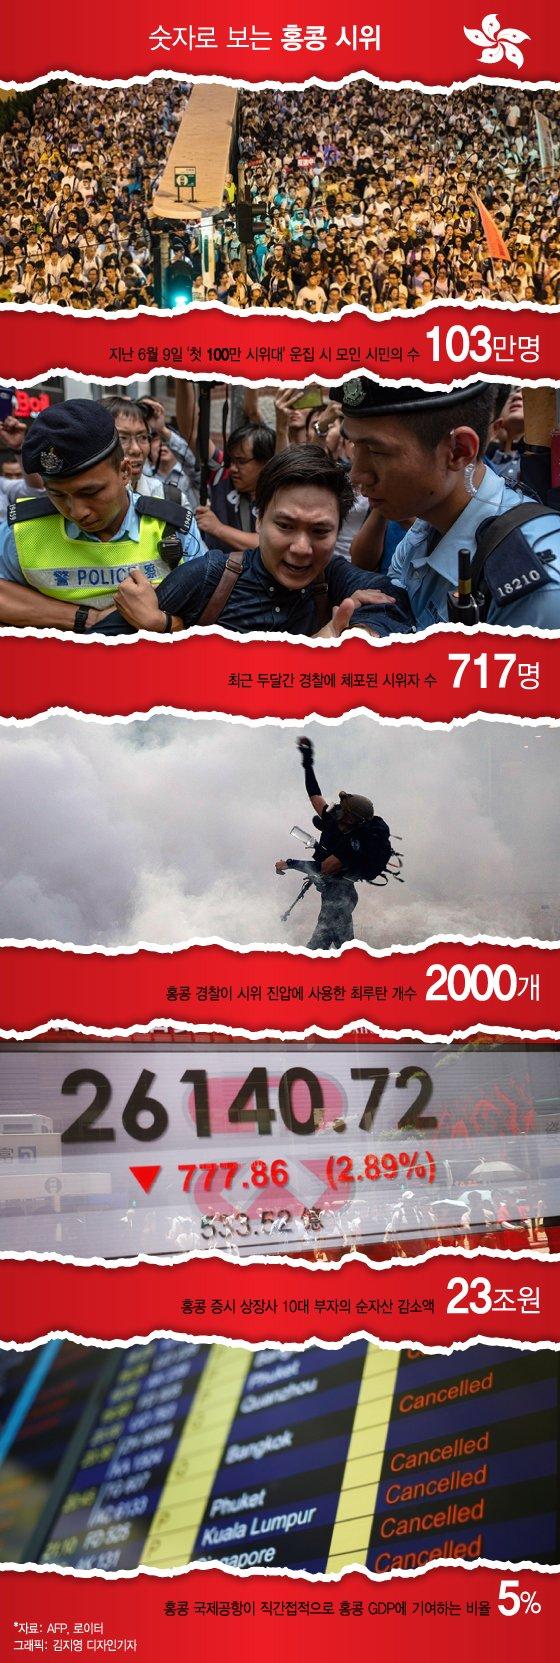 [MT리포트]숫자로 보는 두 달간의 '홍콩 시위'